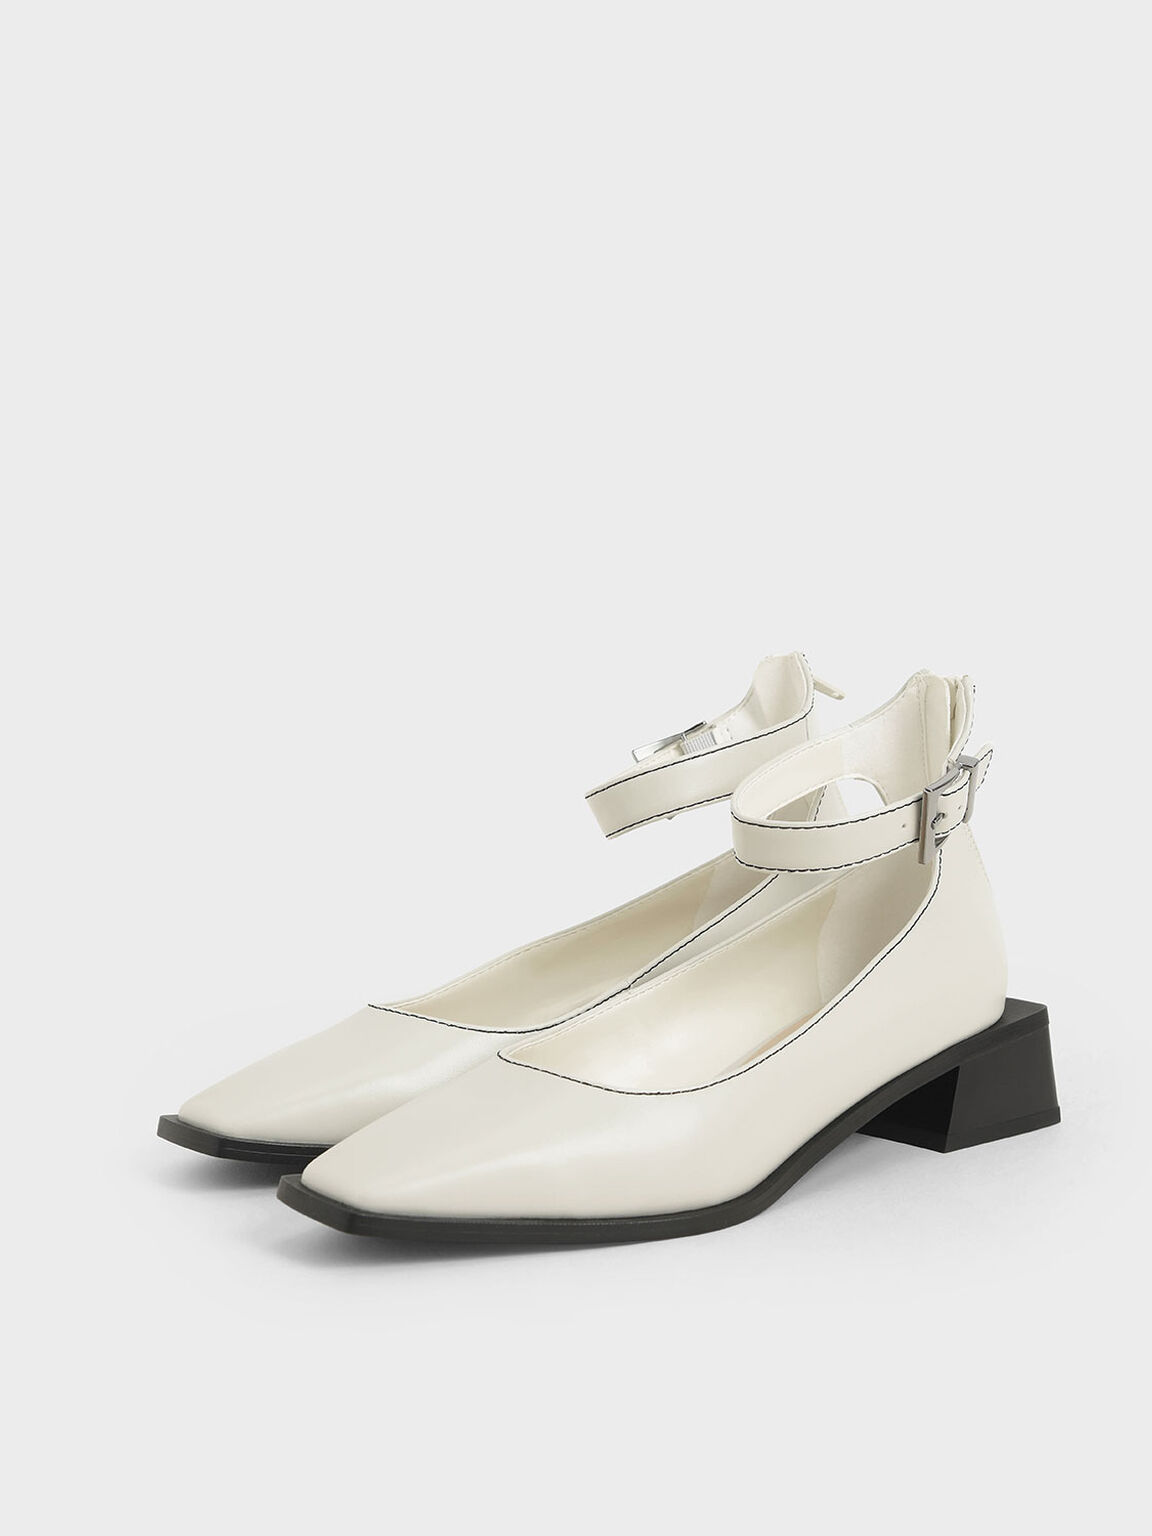 Ankle Strap Square Toe Pumps, White, hi-res